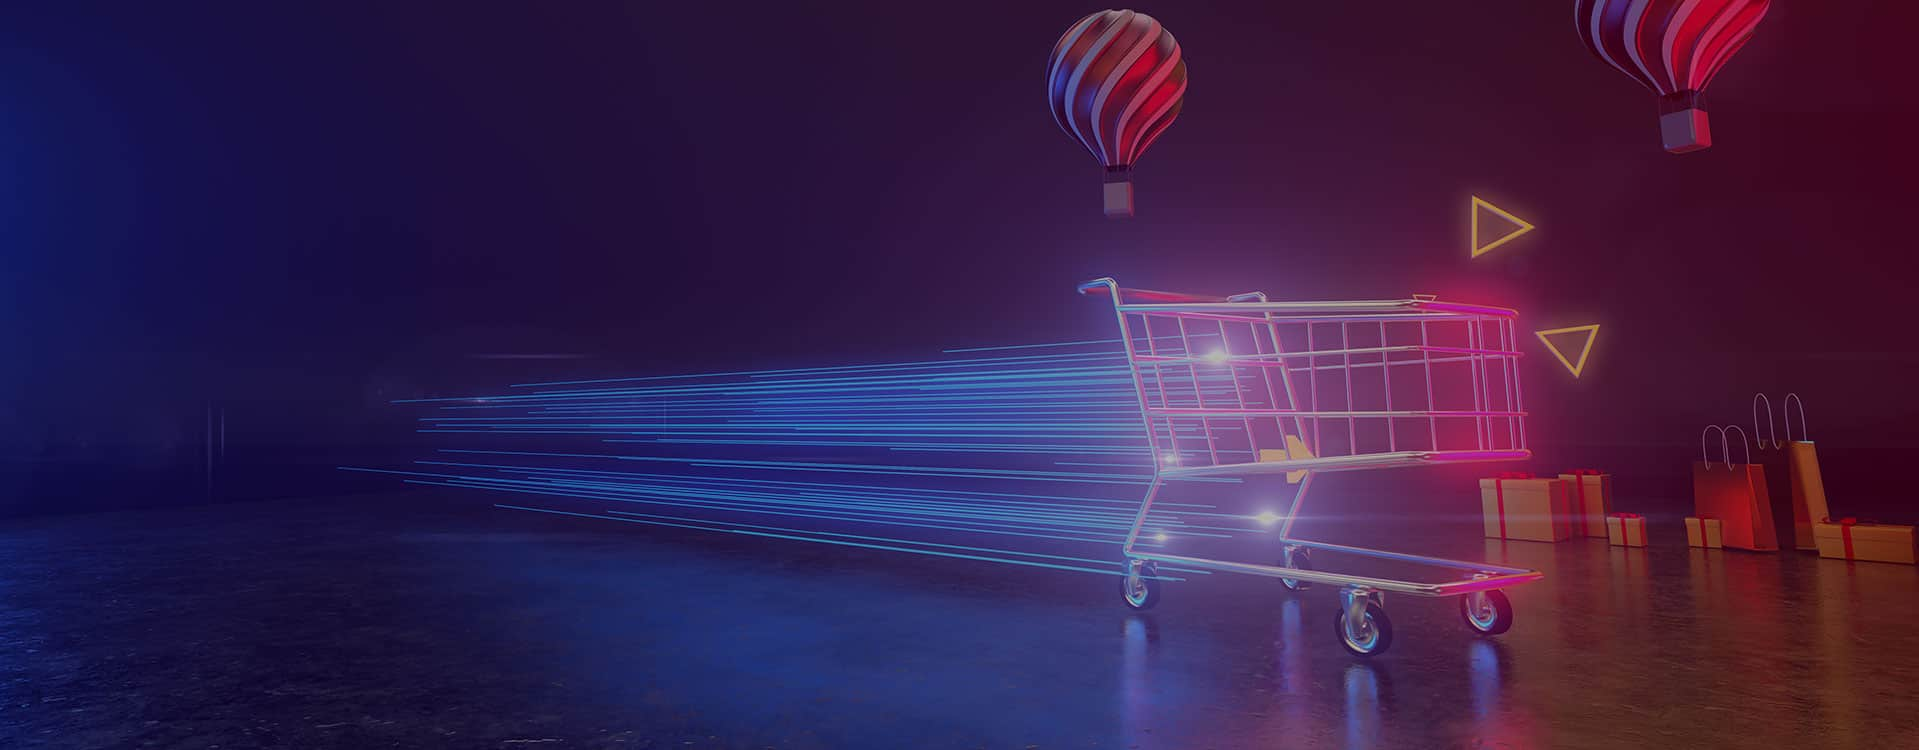 Online Shops Development